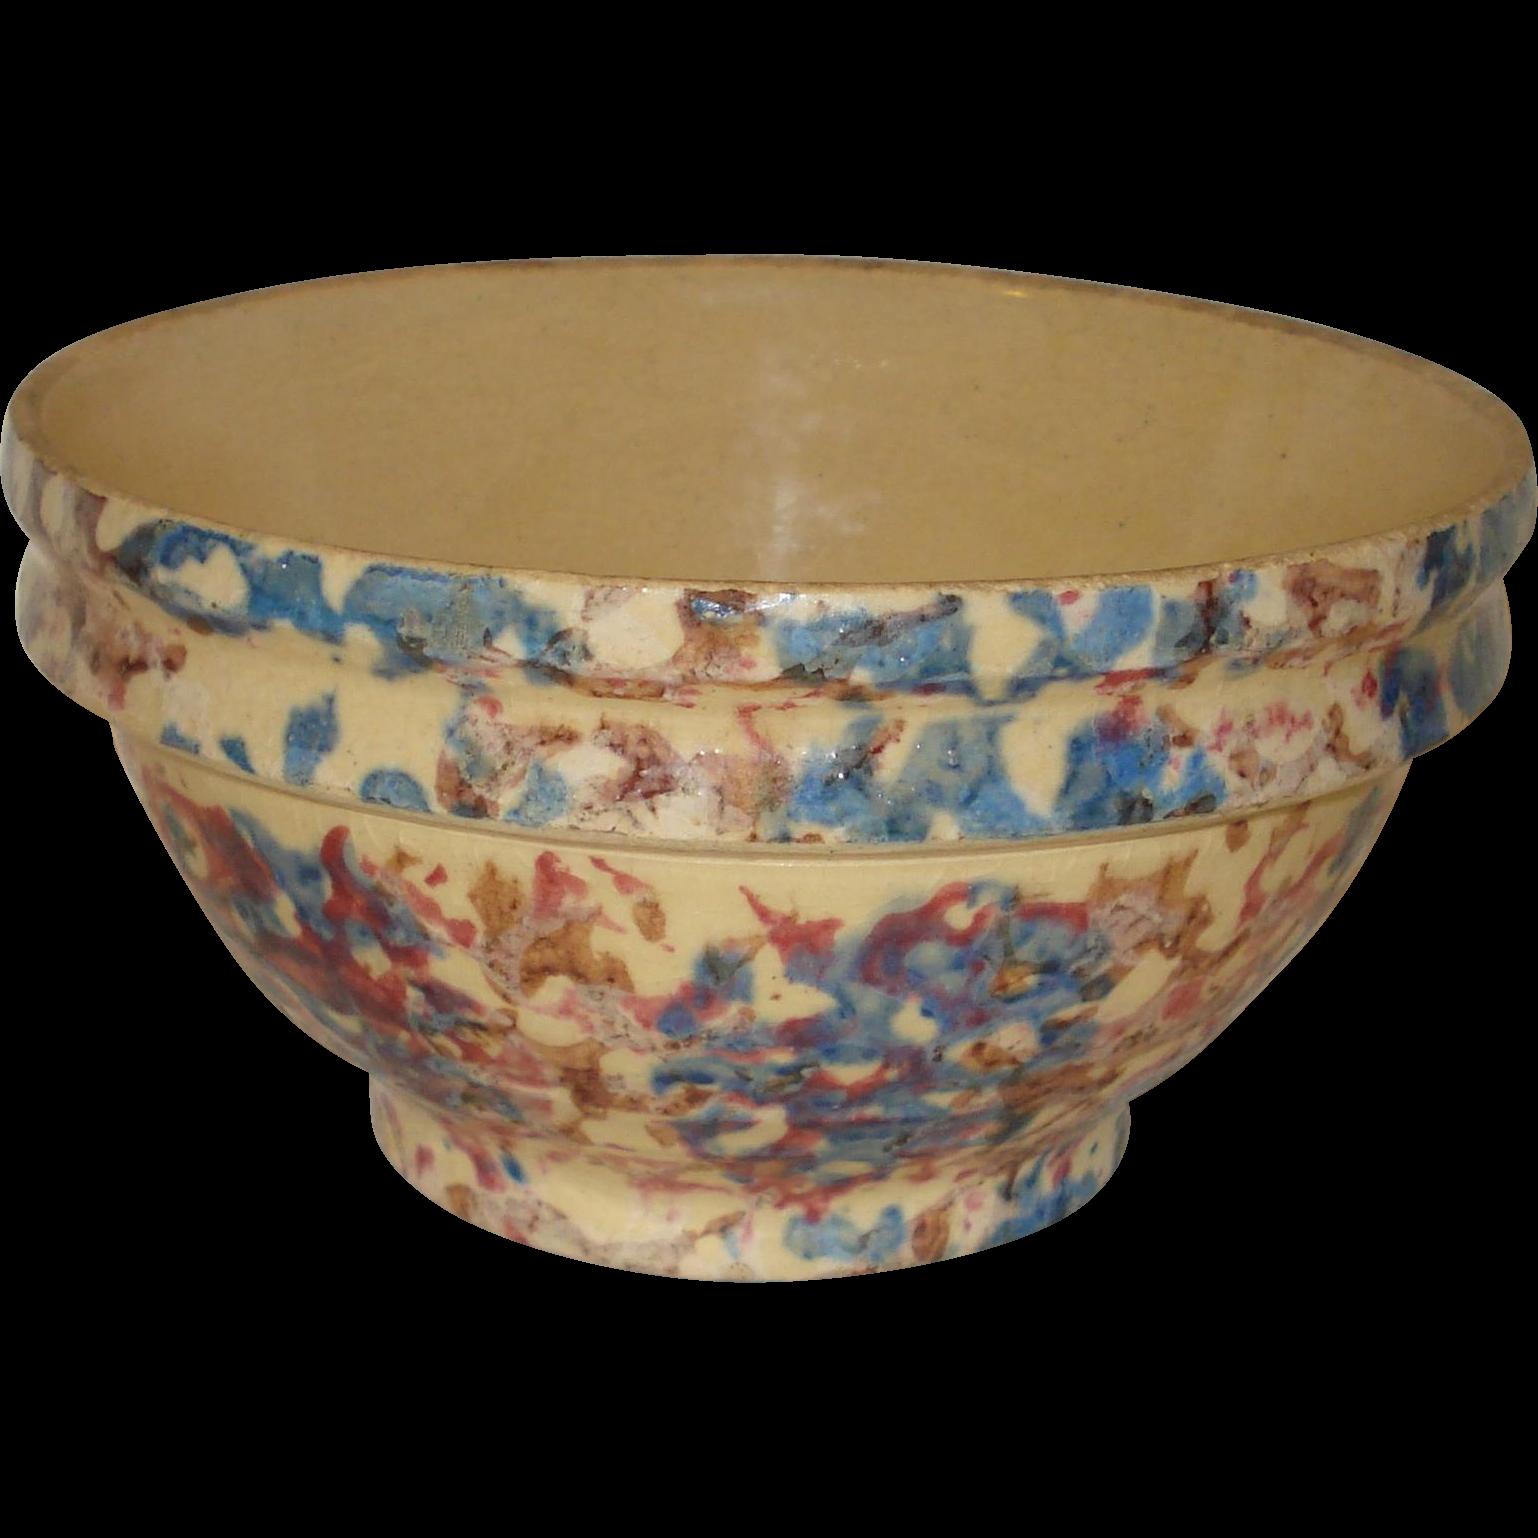 Early Spongeware Spatterware Stoneware Bowl